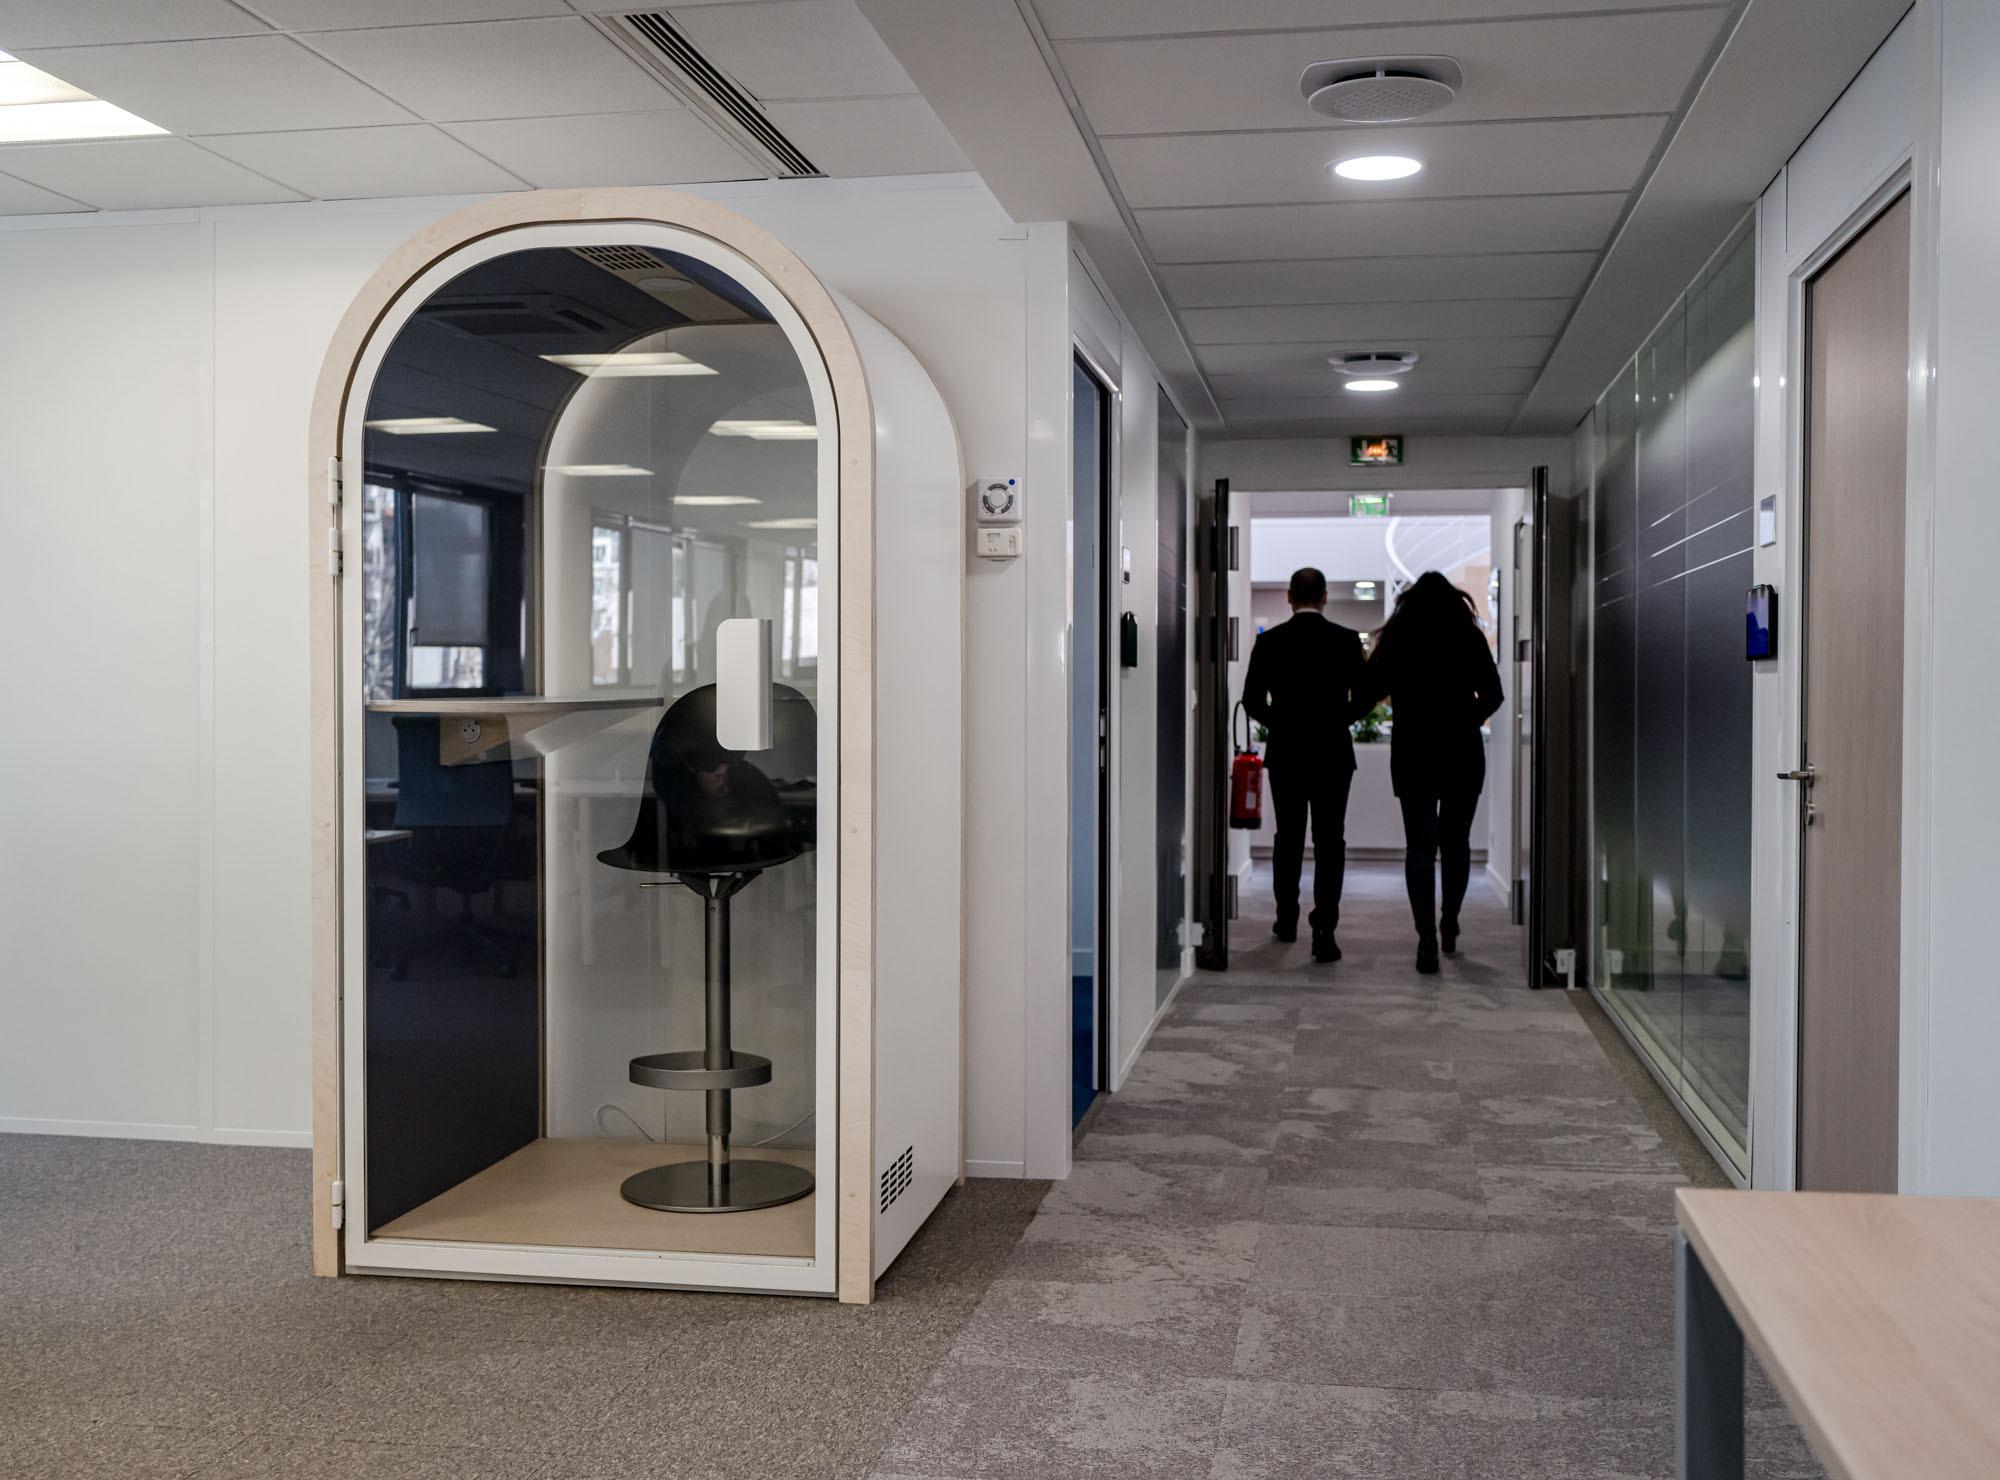 Econocom choosesArche for its new generation headquarters